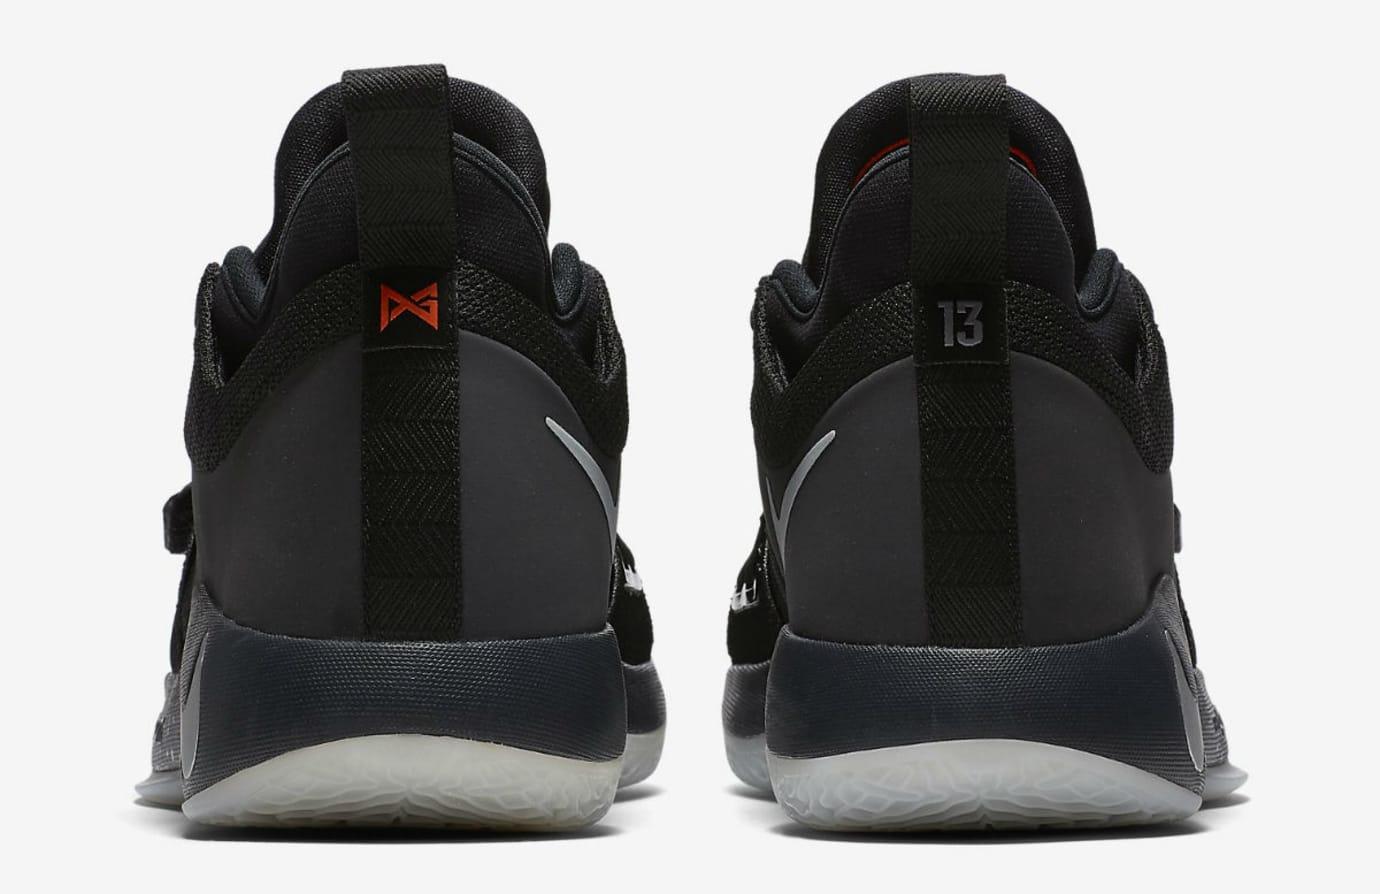 Nike PG 2.5 Black Pure Platinum Anthracite Release Date BQ8453-004 Heel